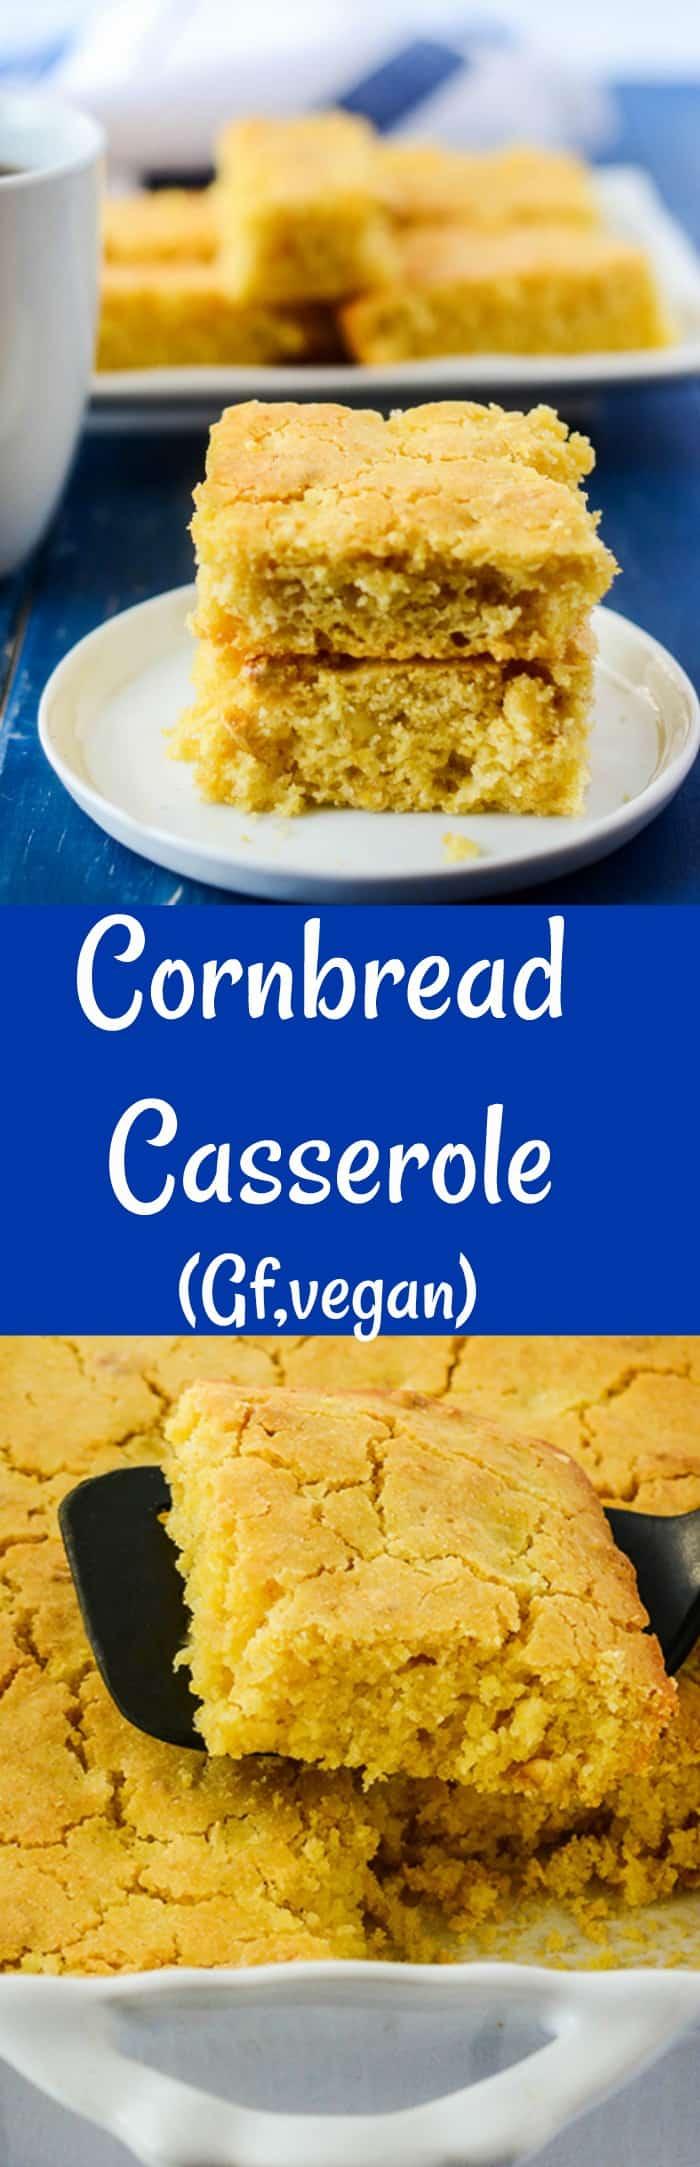 Cornbread Casserole (Vegan, Gluten-Free)